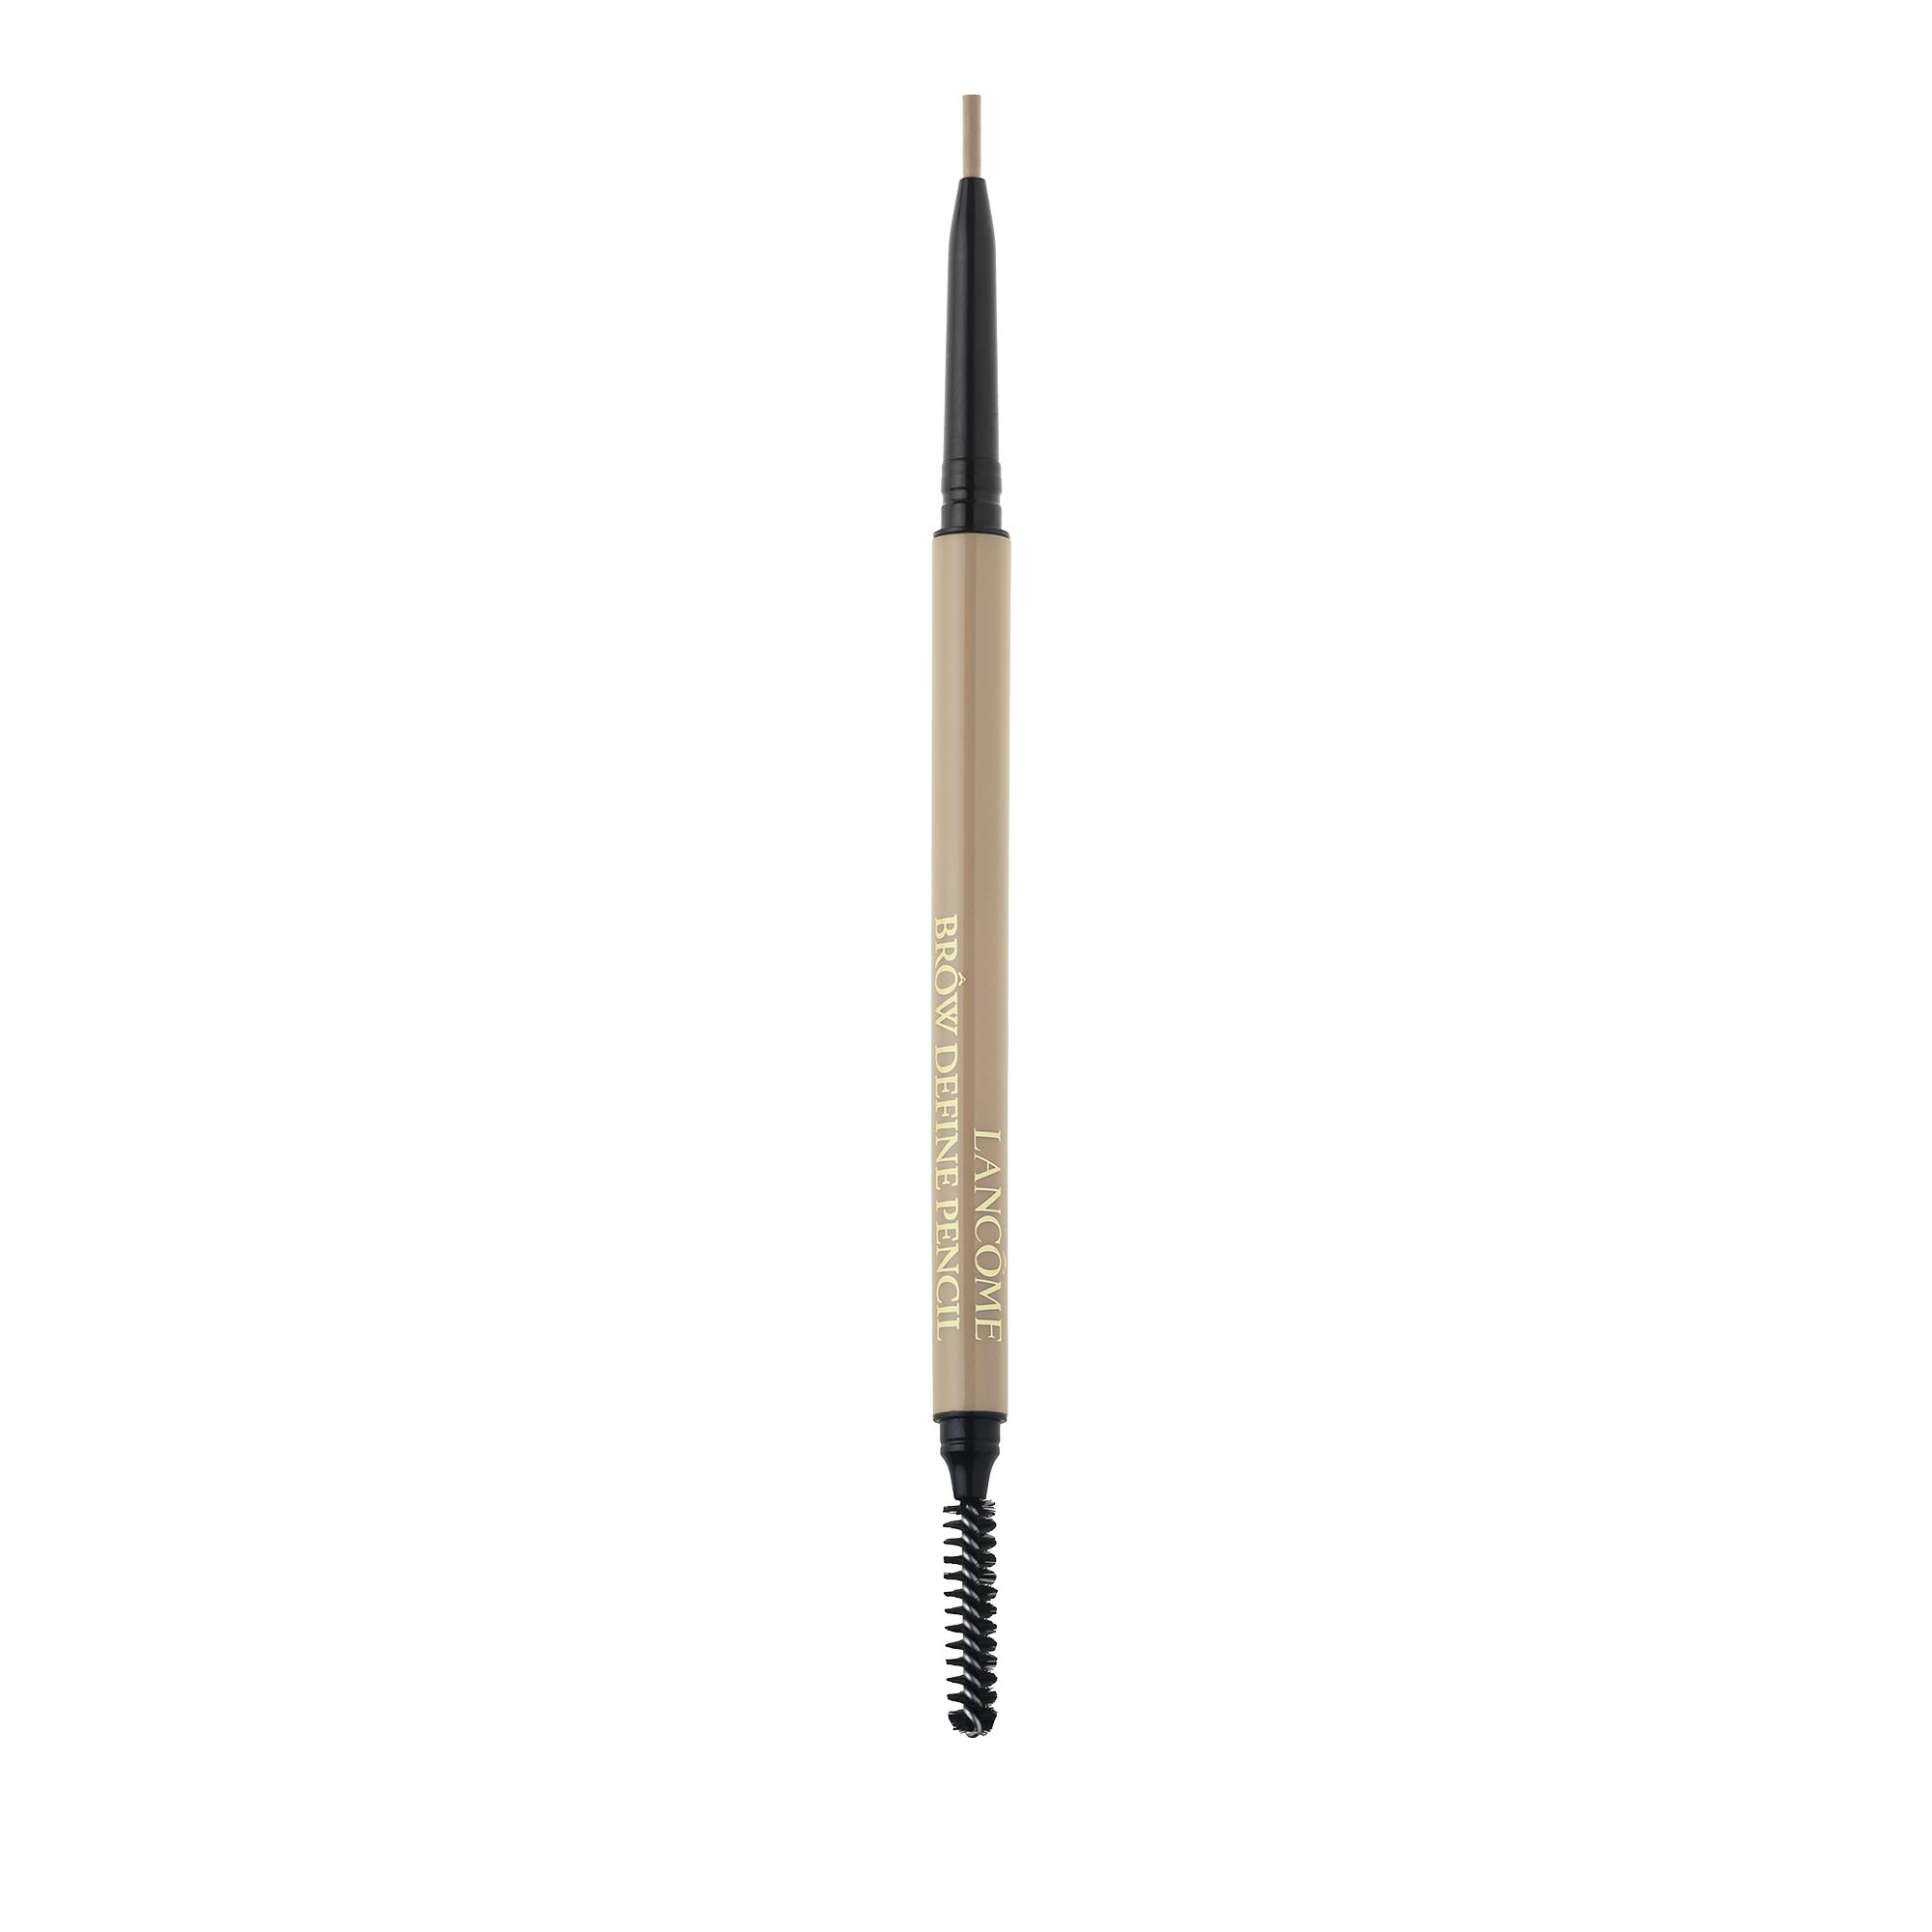 Lancôme Define Brow Pencil, 02 blonde